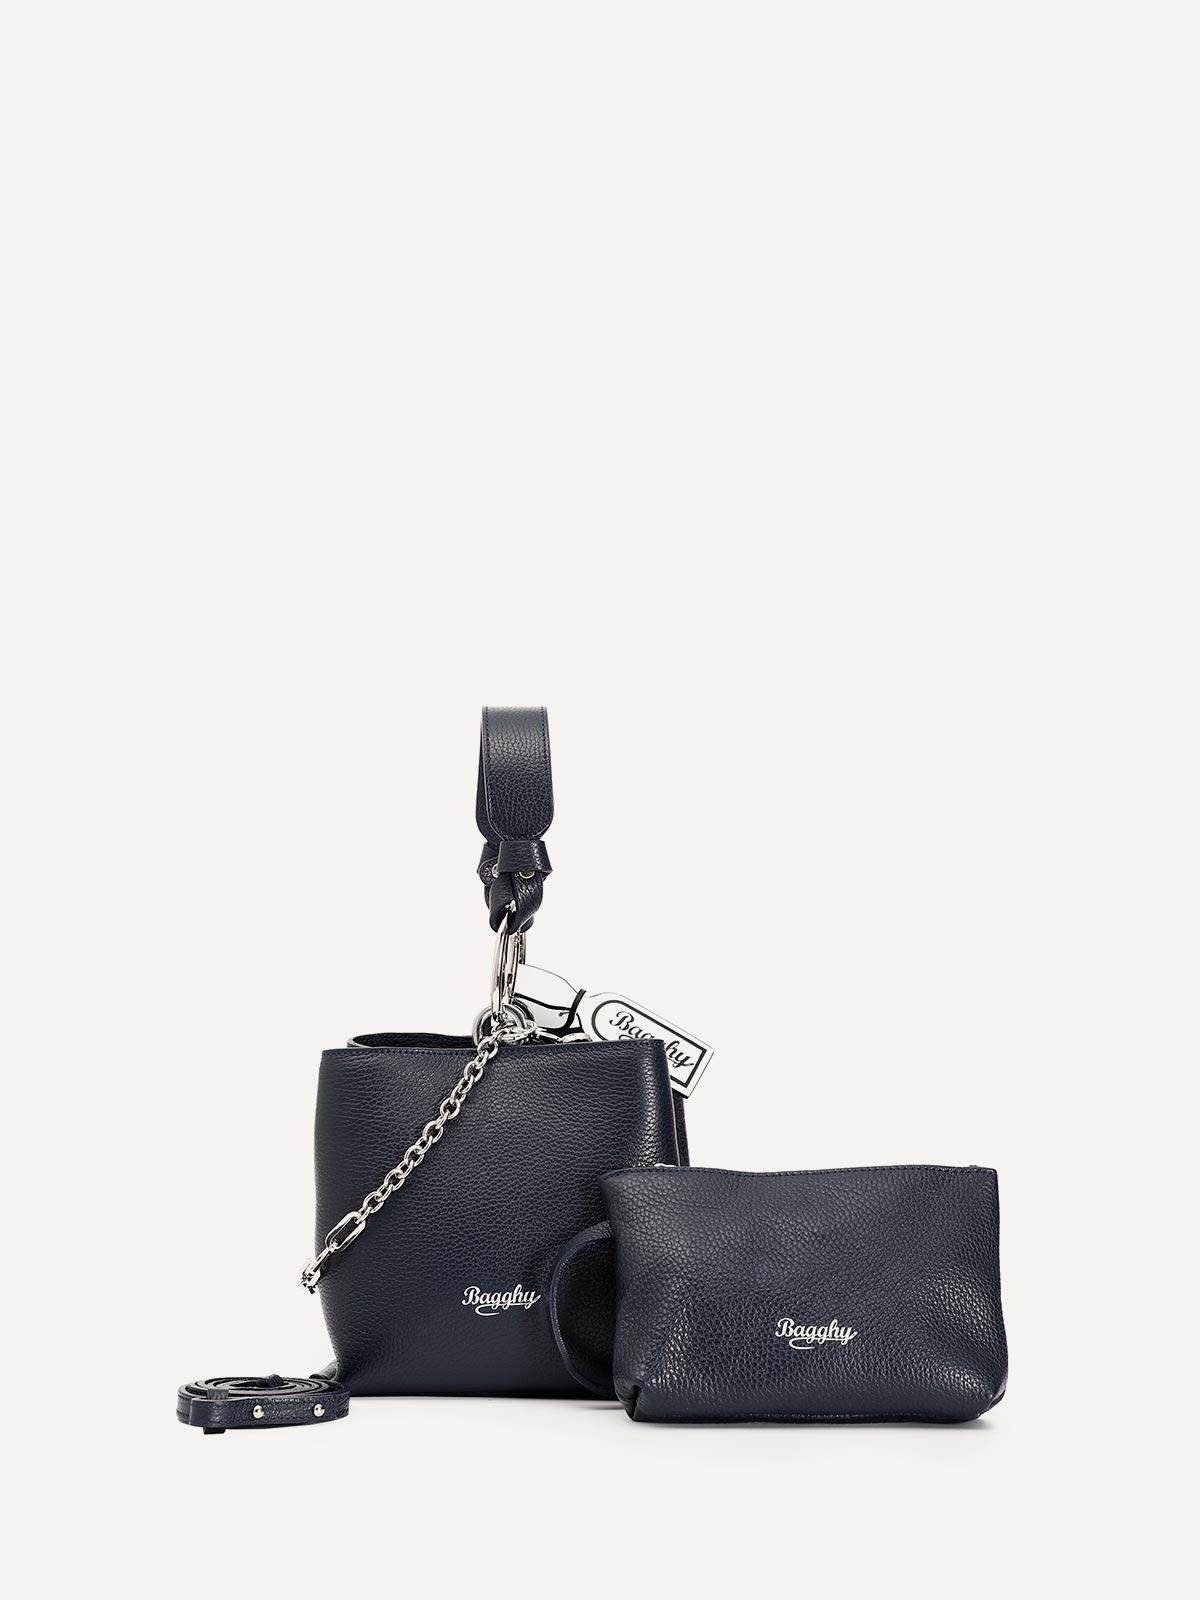 Bagghy Bag borsa nera donna